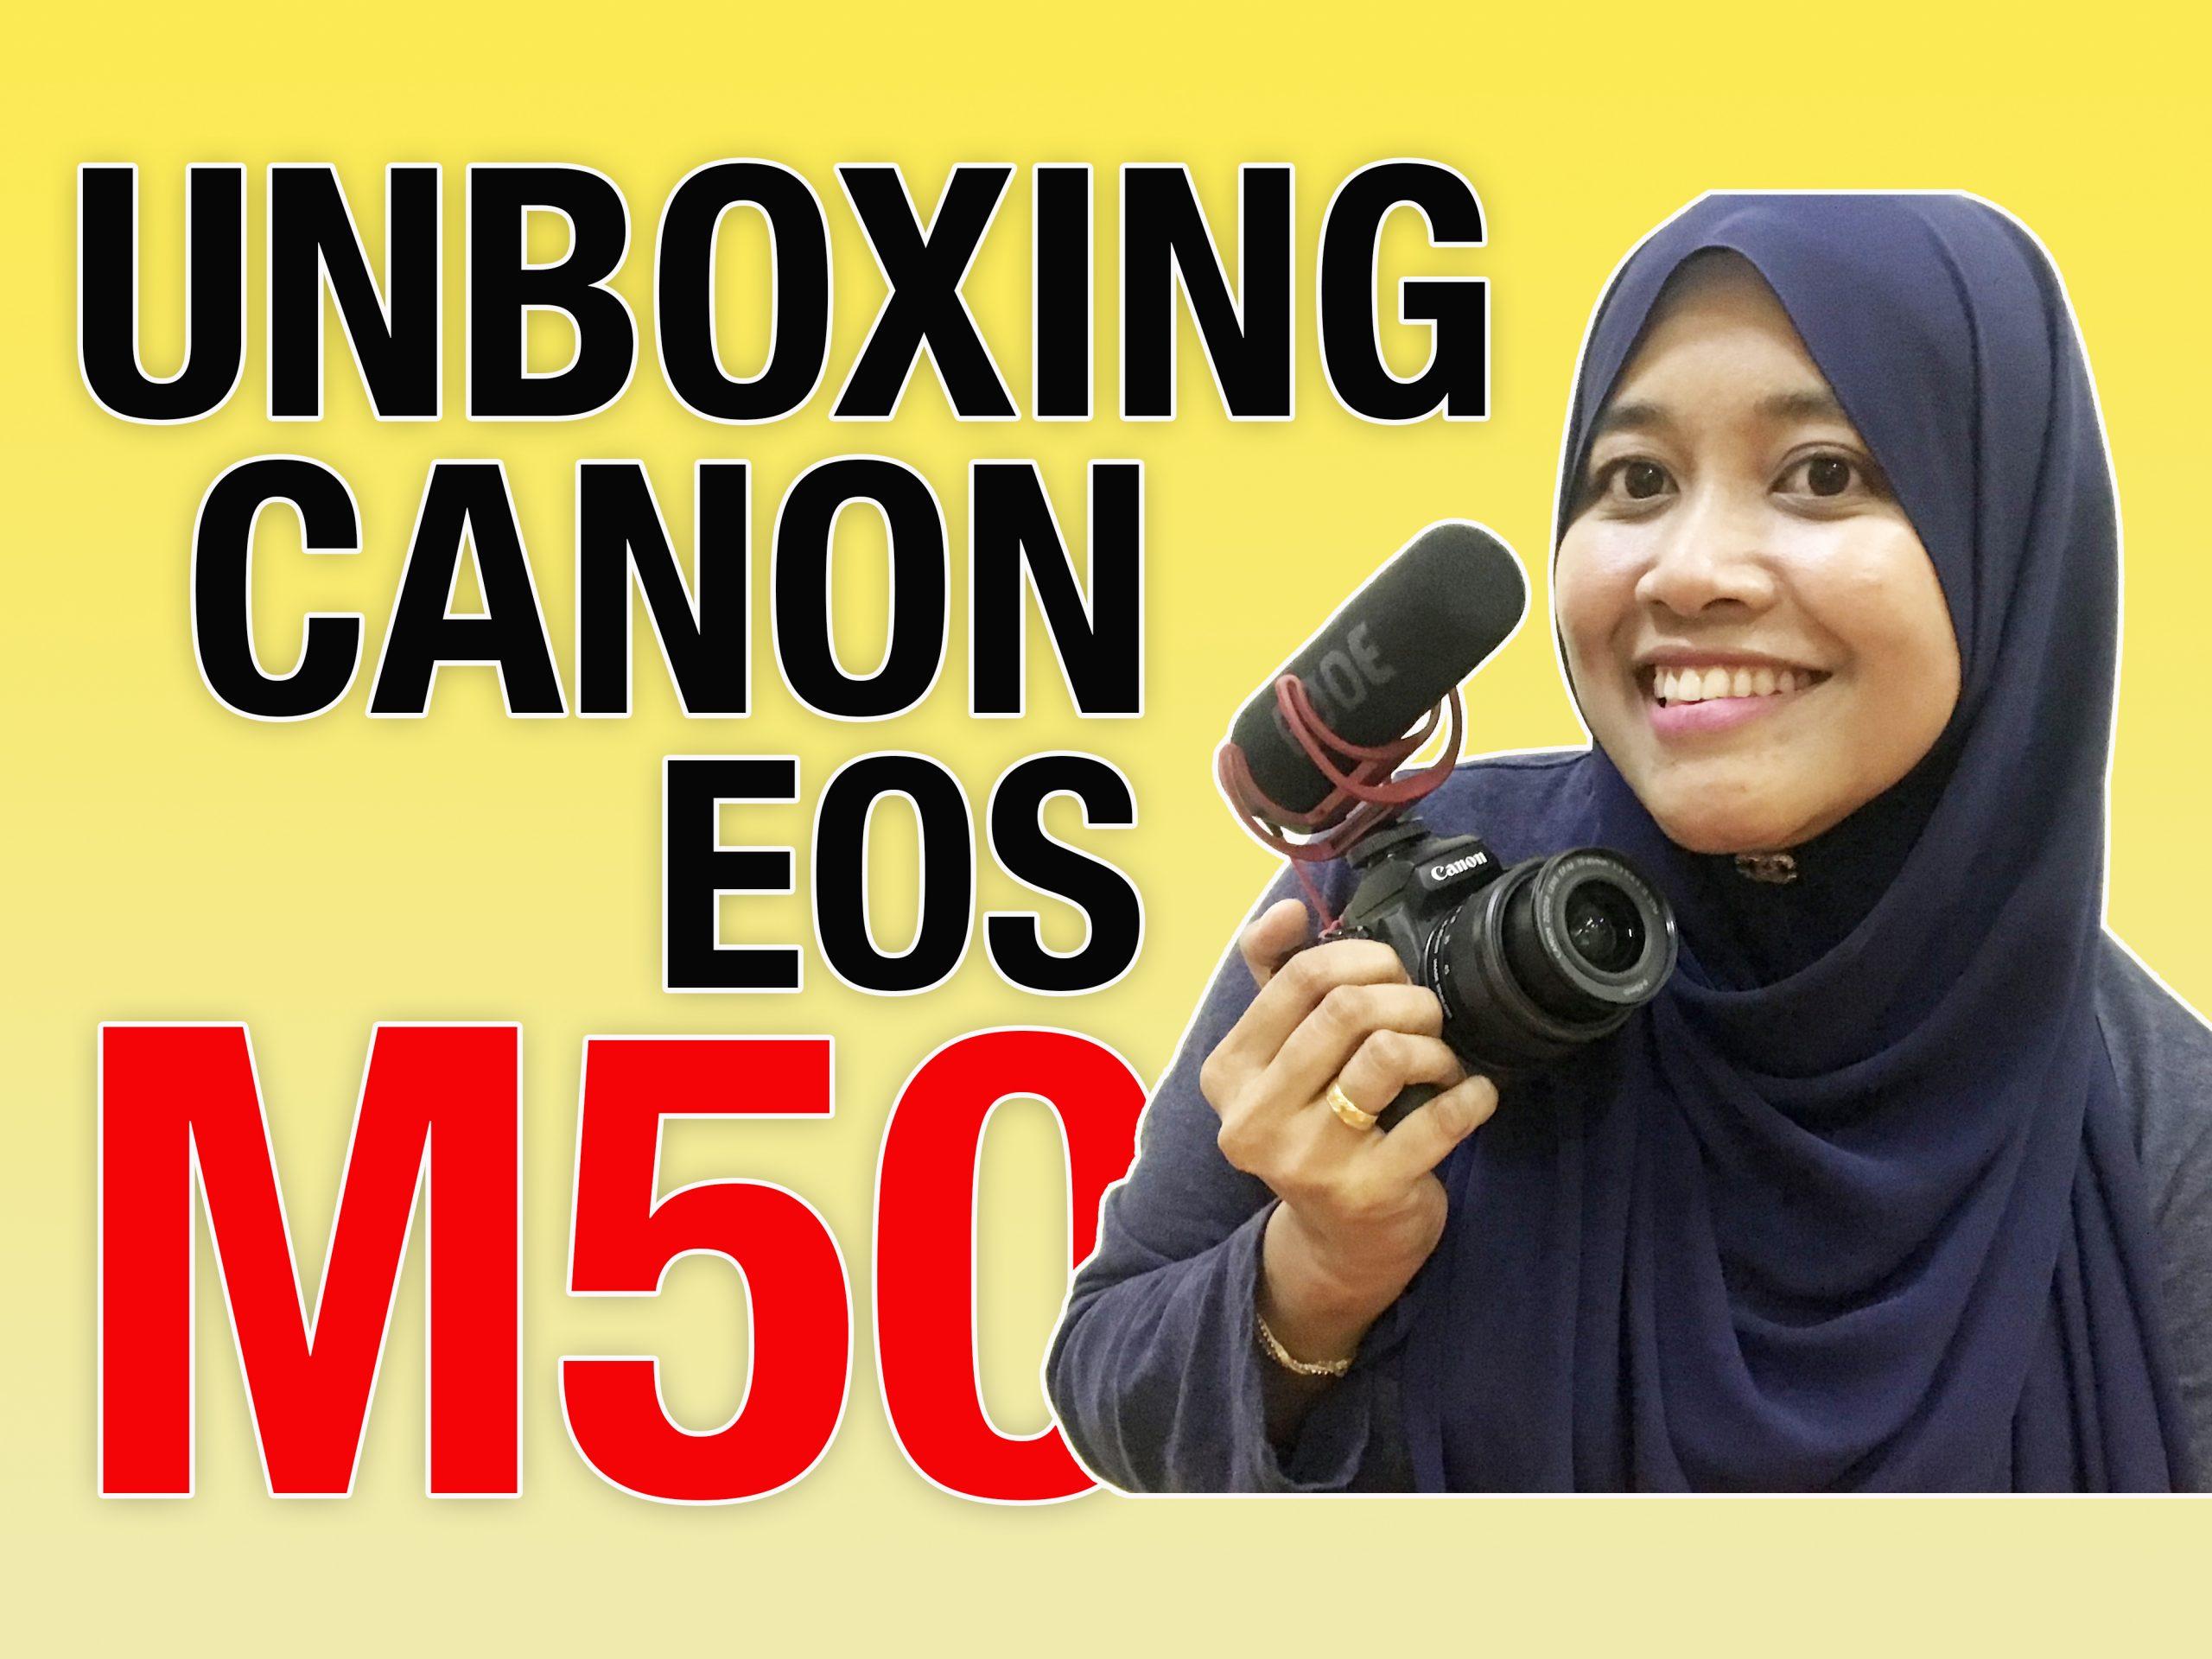 Canon EOS M50 (Unboxing) – Kamera untuk Vlogging